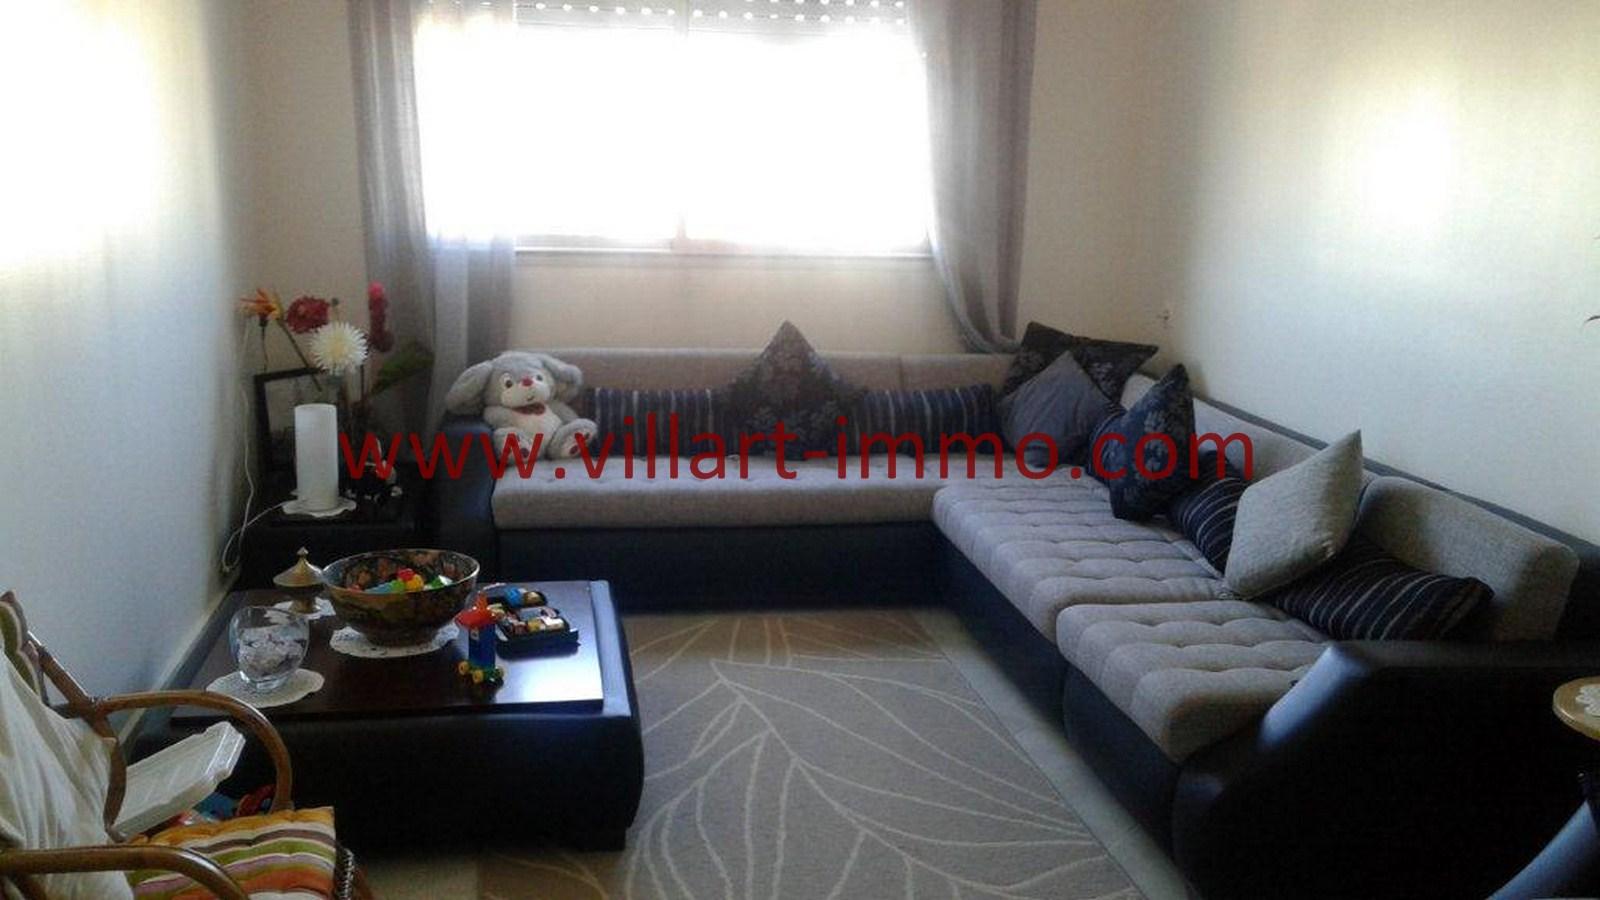 1-A vendre-Appartement-Tanger-Castilla-Salon 1-VA473-Villart immo-Agence Immobilière